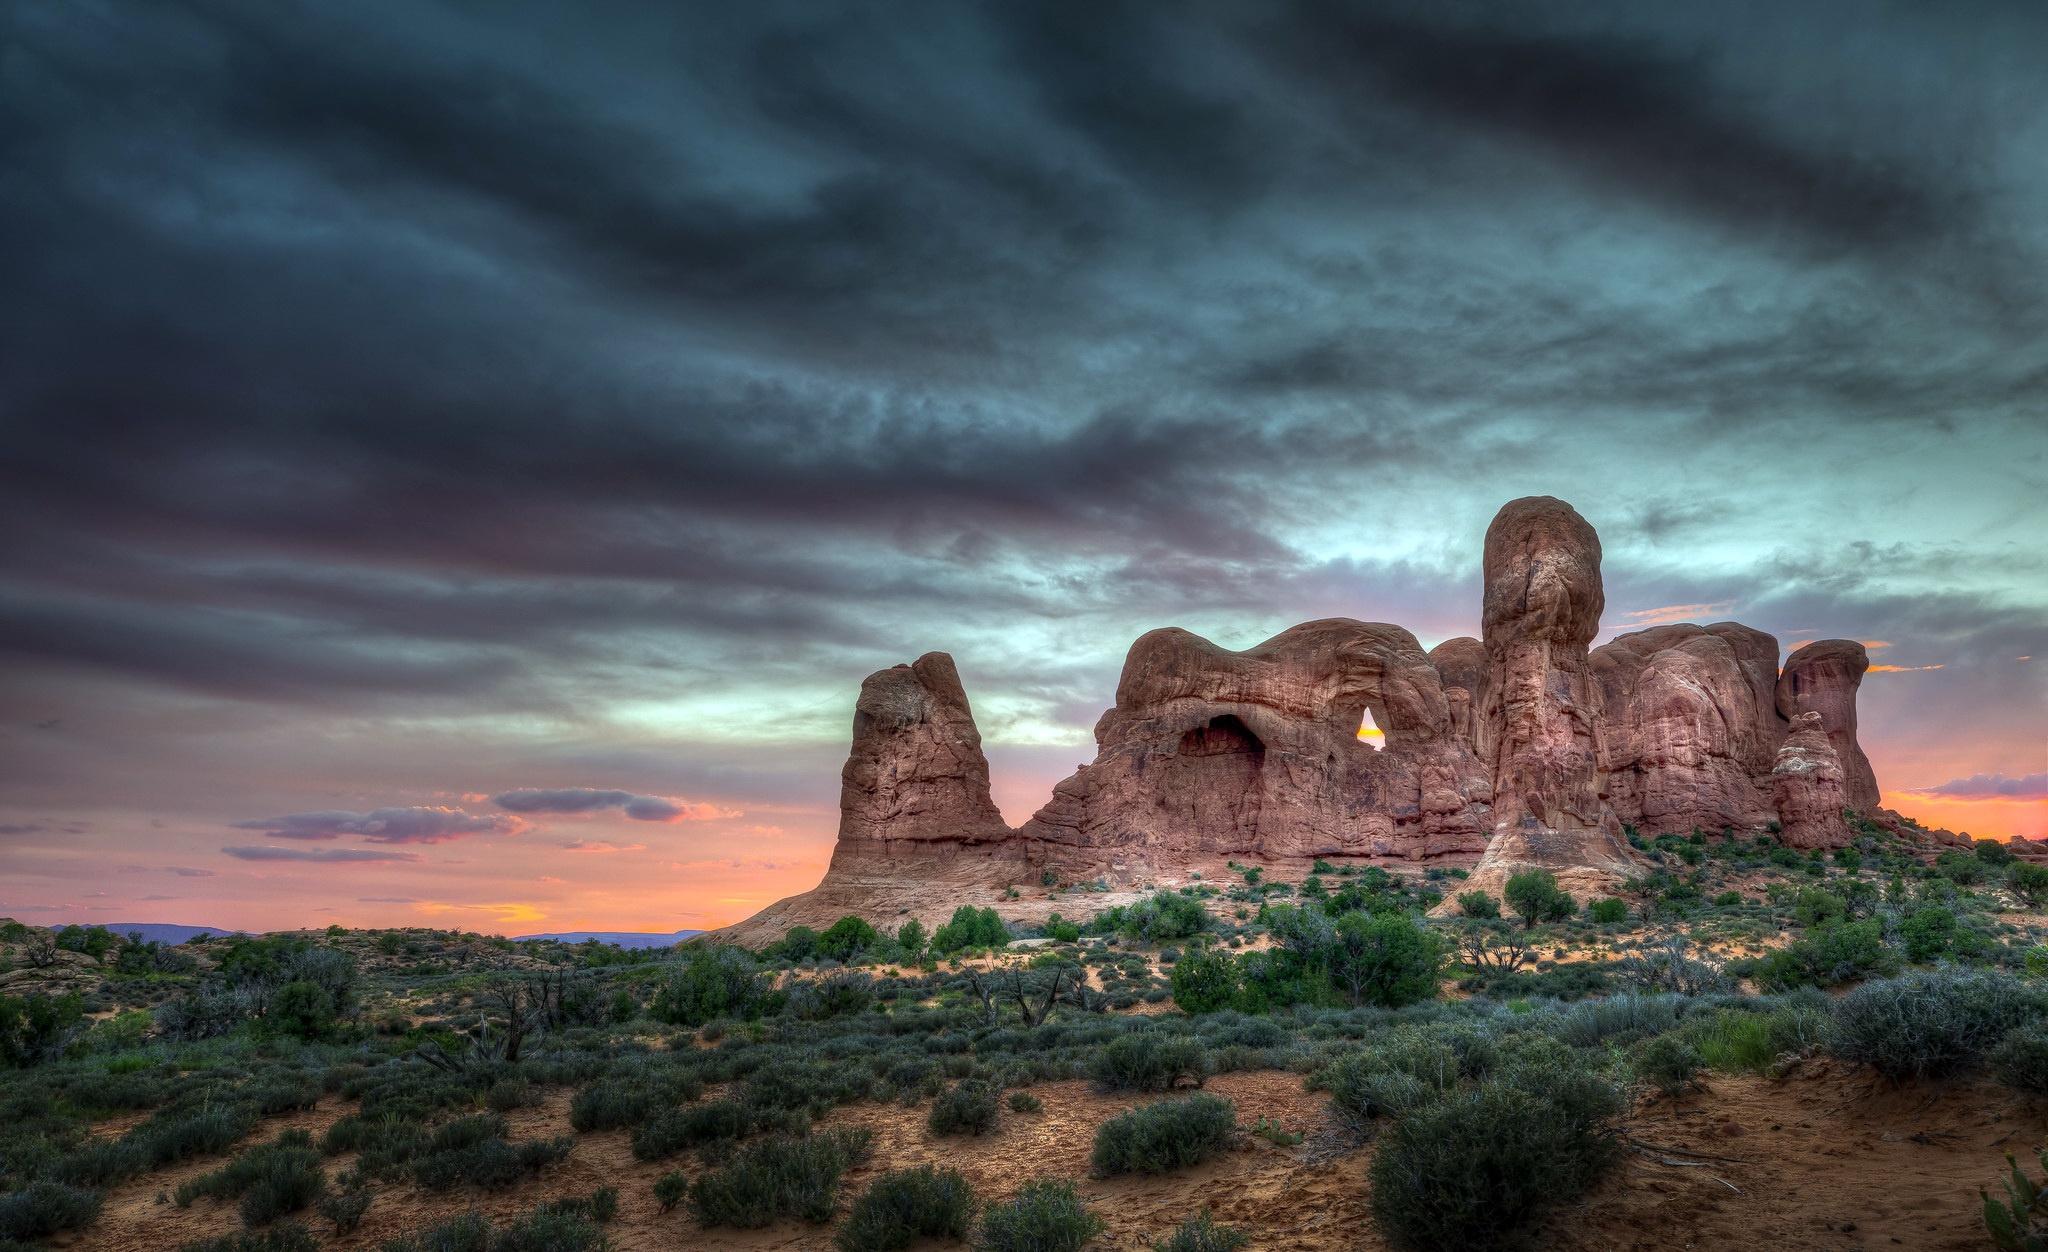 General 2048x1252 nature national park landscape rock clouds shrubbery rock formation desert